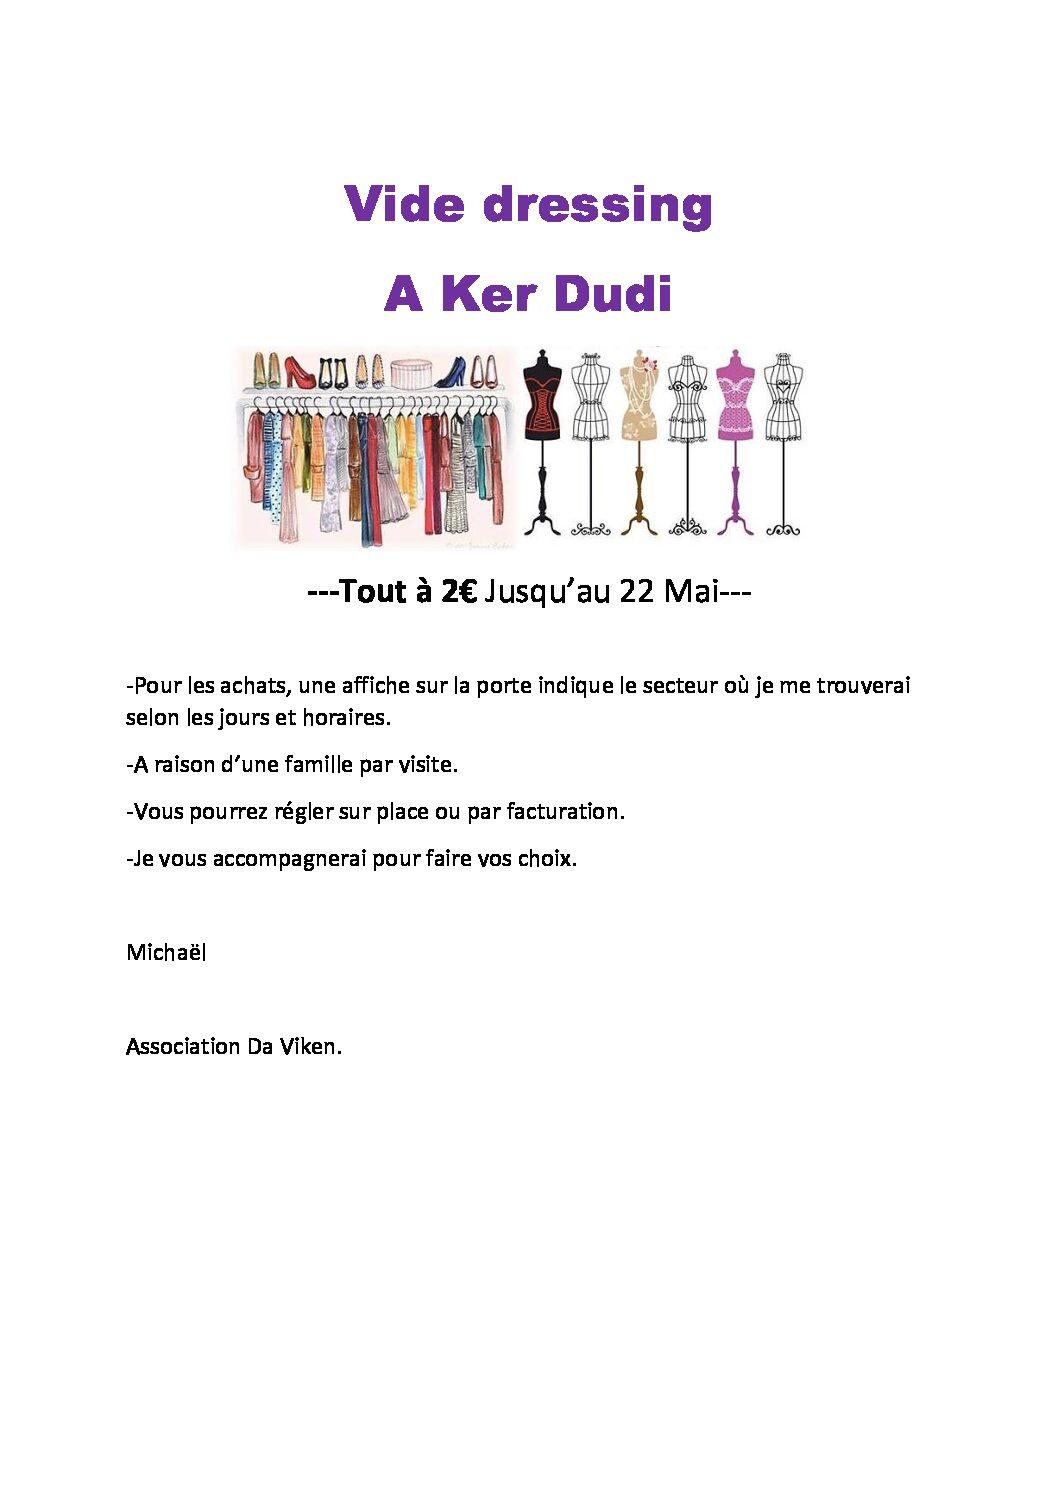 Vide-dressing-courrier-familles-2-1-pdf